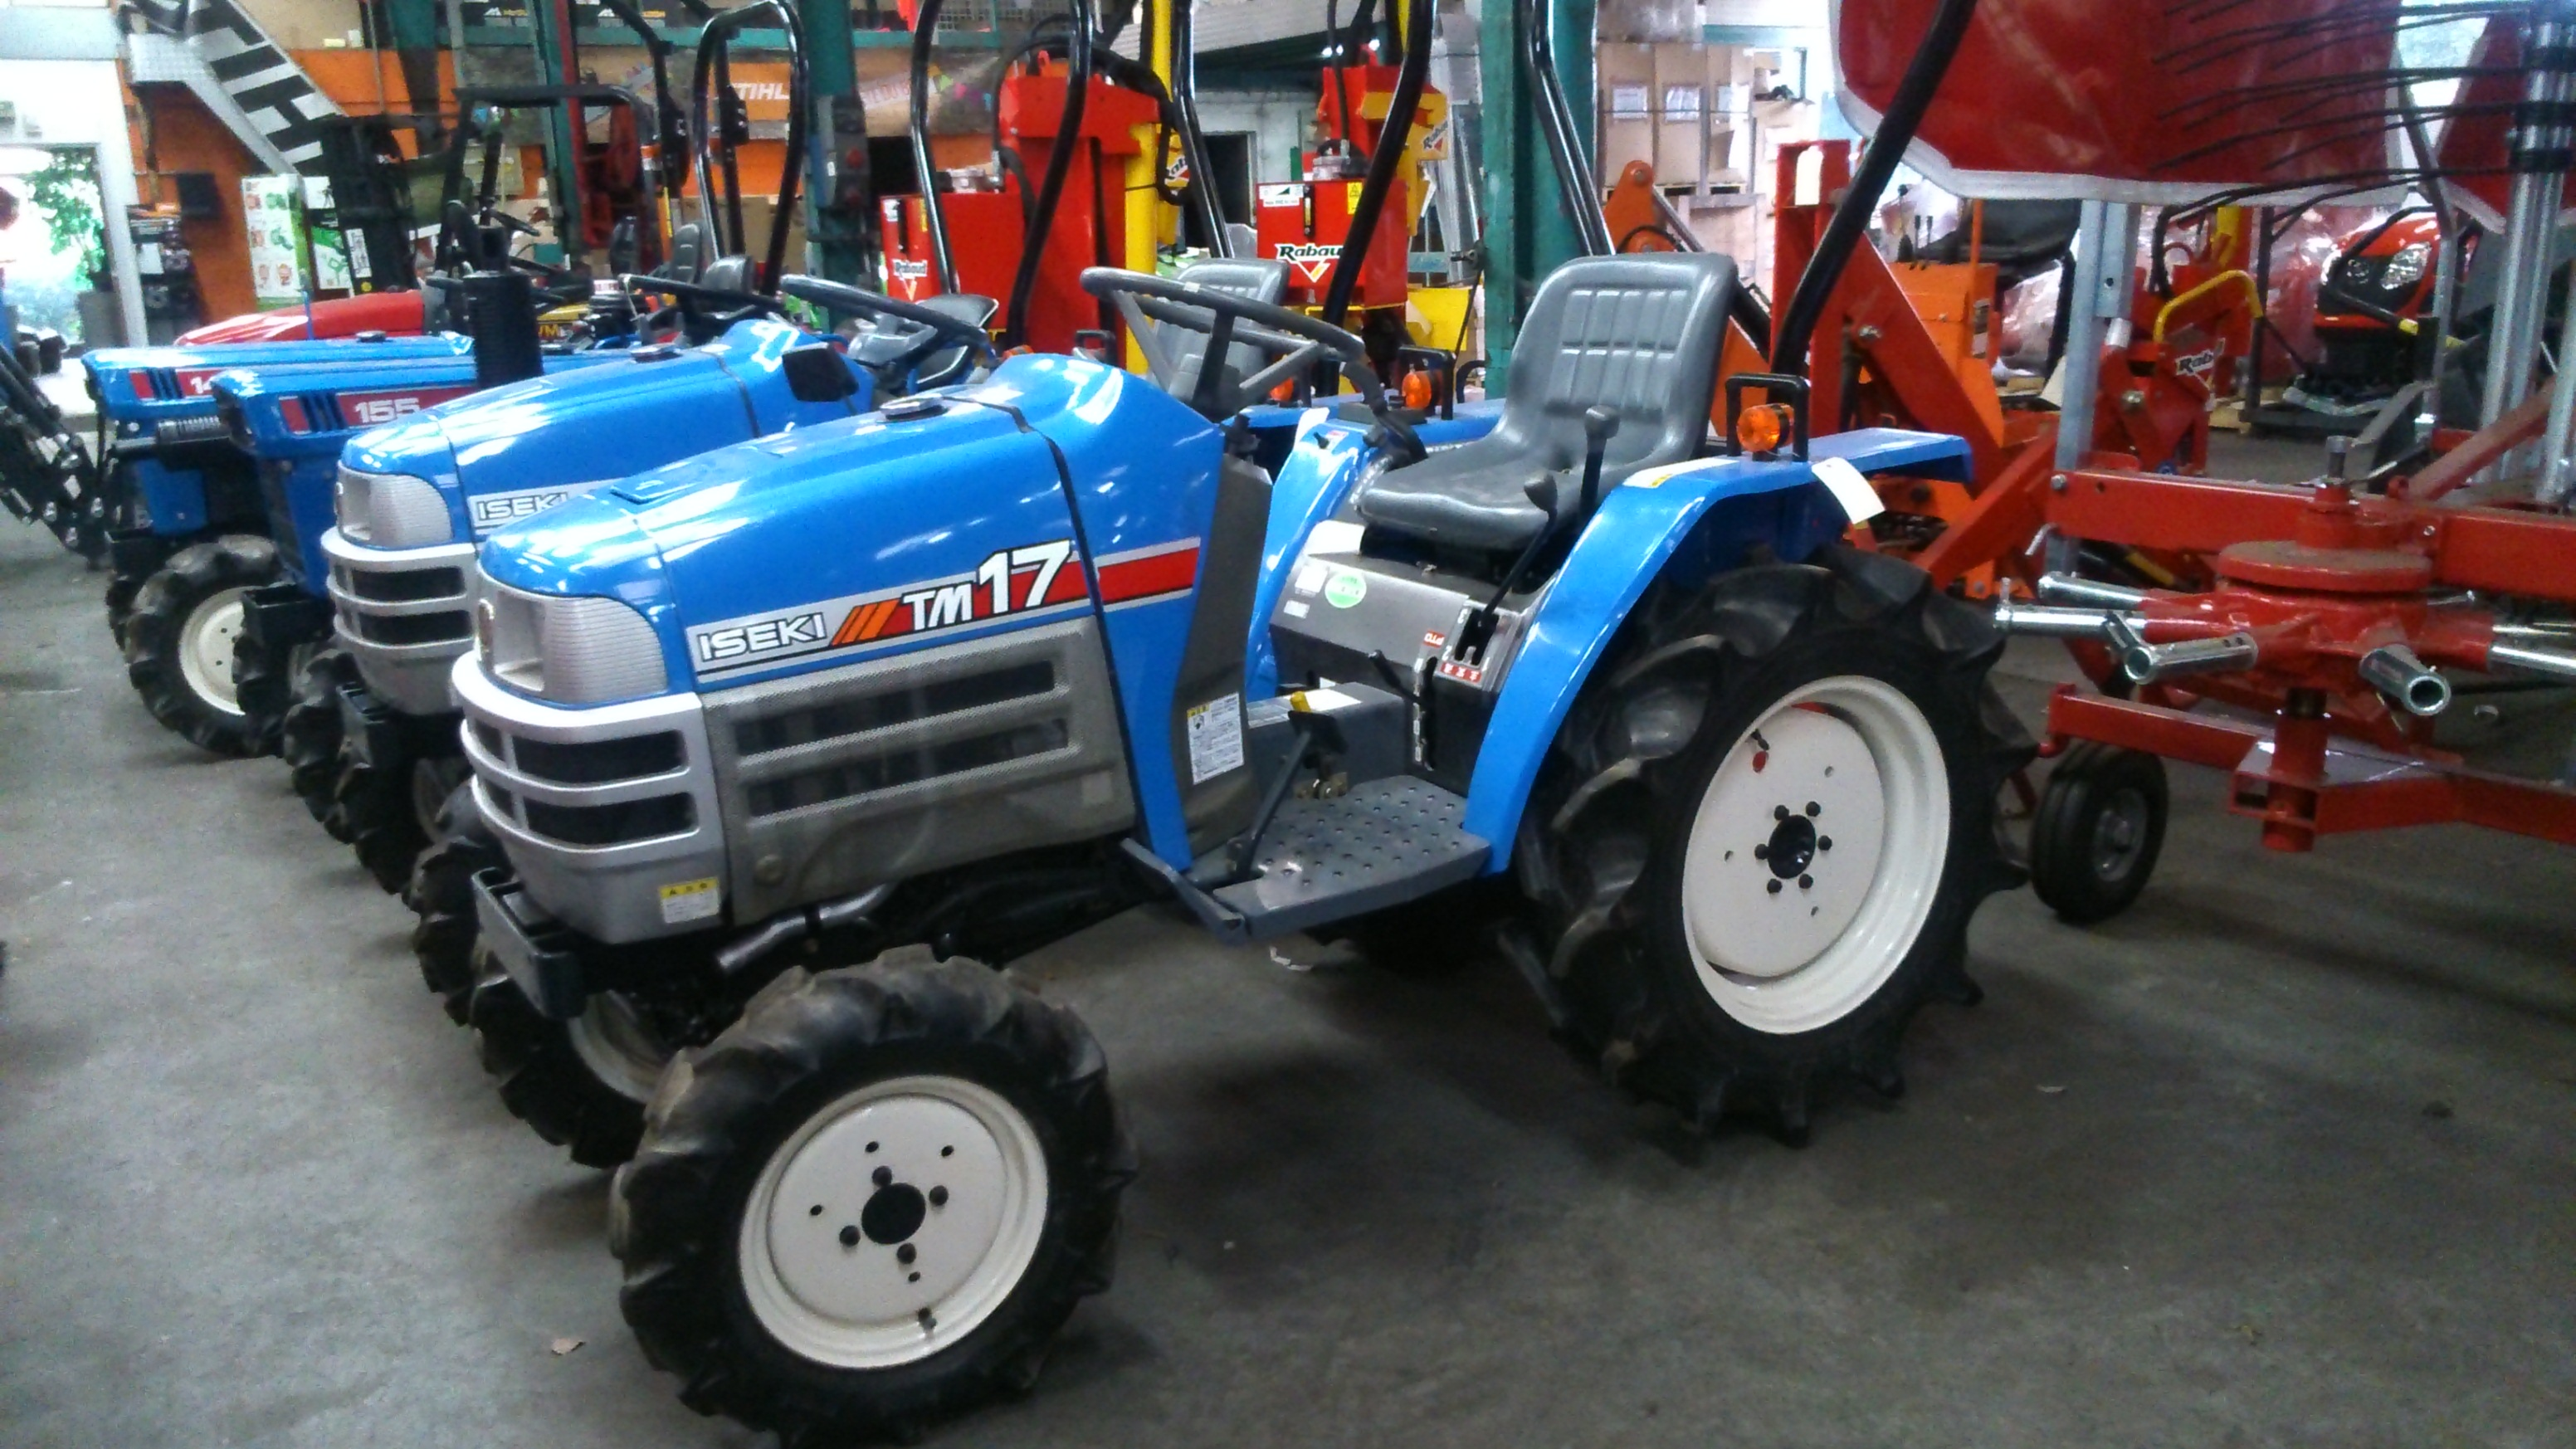 jp france tracteur iseki tm17 4rm 18cv jpl tracteurs et microtracteurs tracteurs et. Black Bedroom Furniture Sets. Home Design Ideas